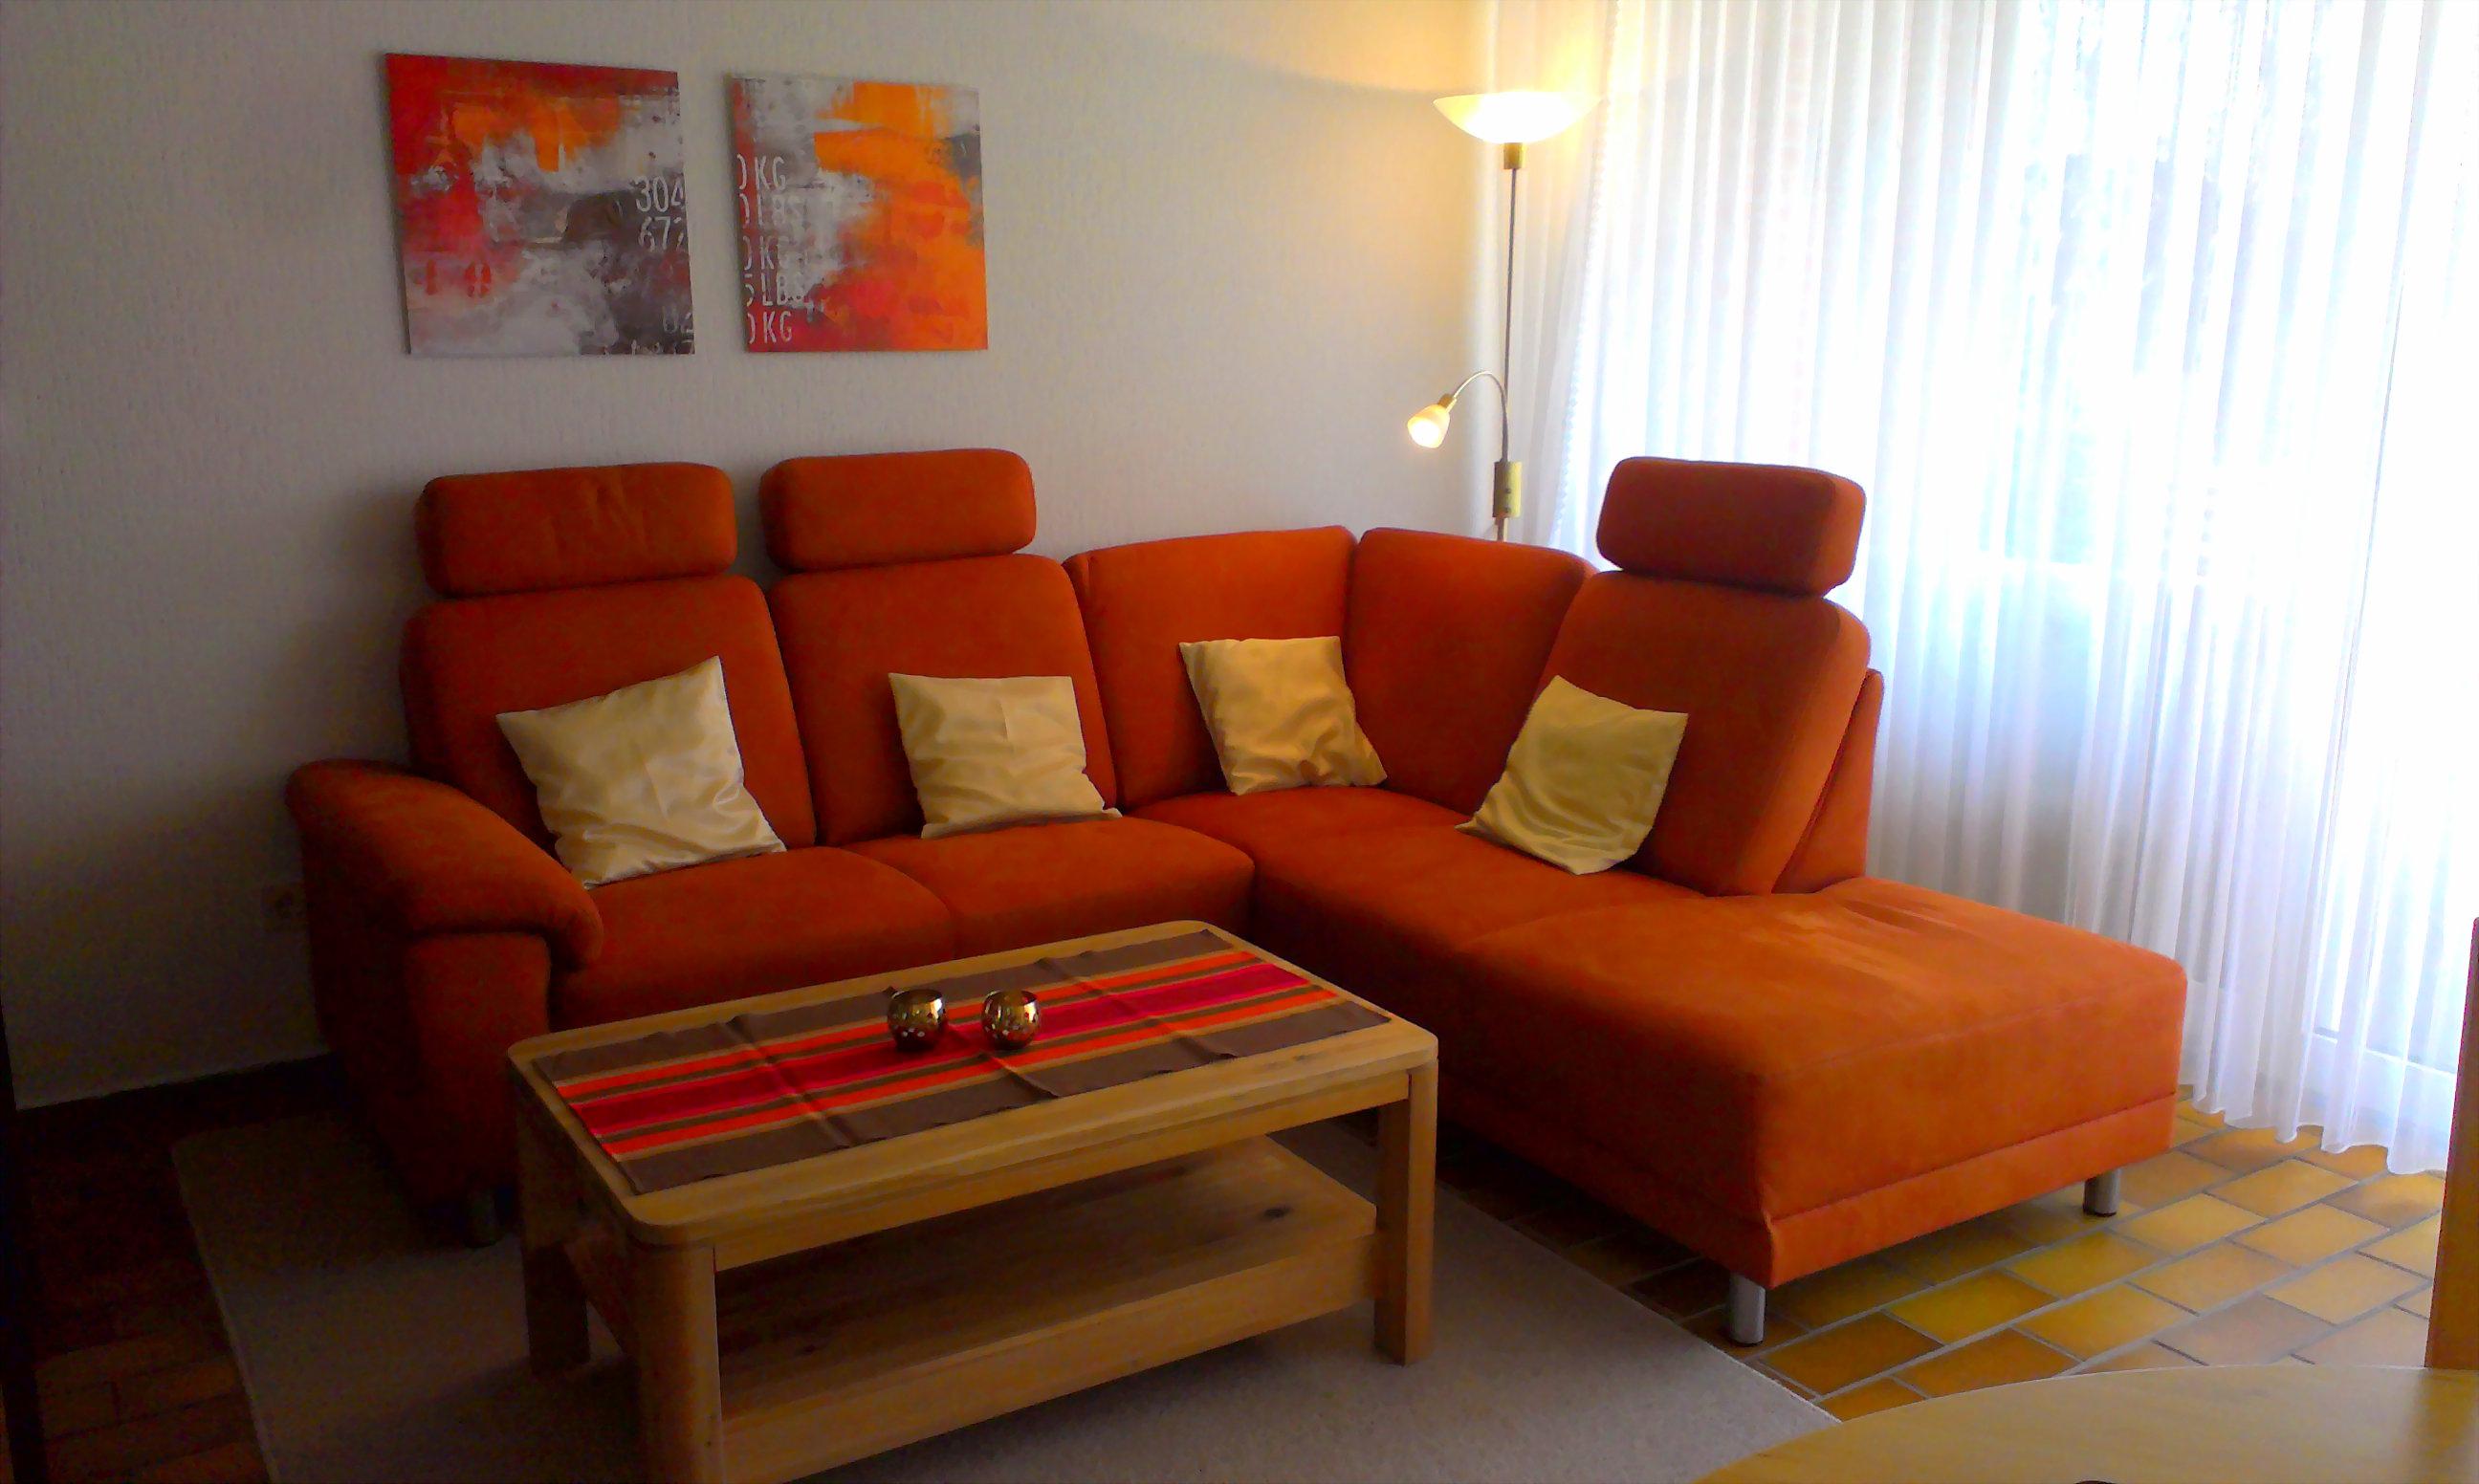 78 ferienhaus im nordseebad bensersiel. Black Bedroom Furniture Sets. Home Design Ideas